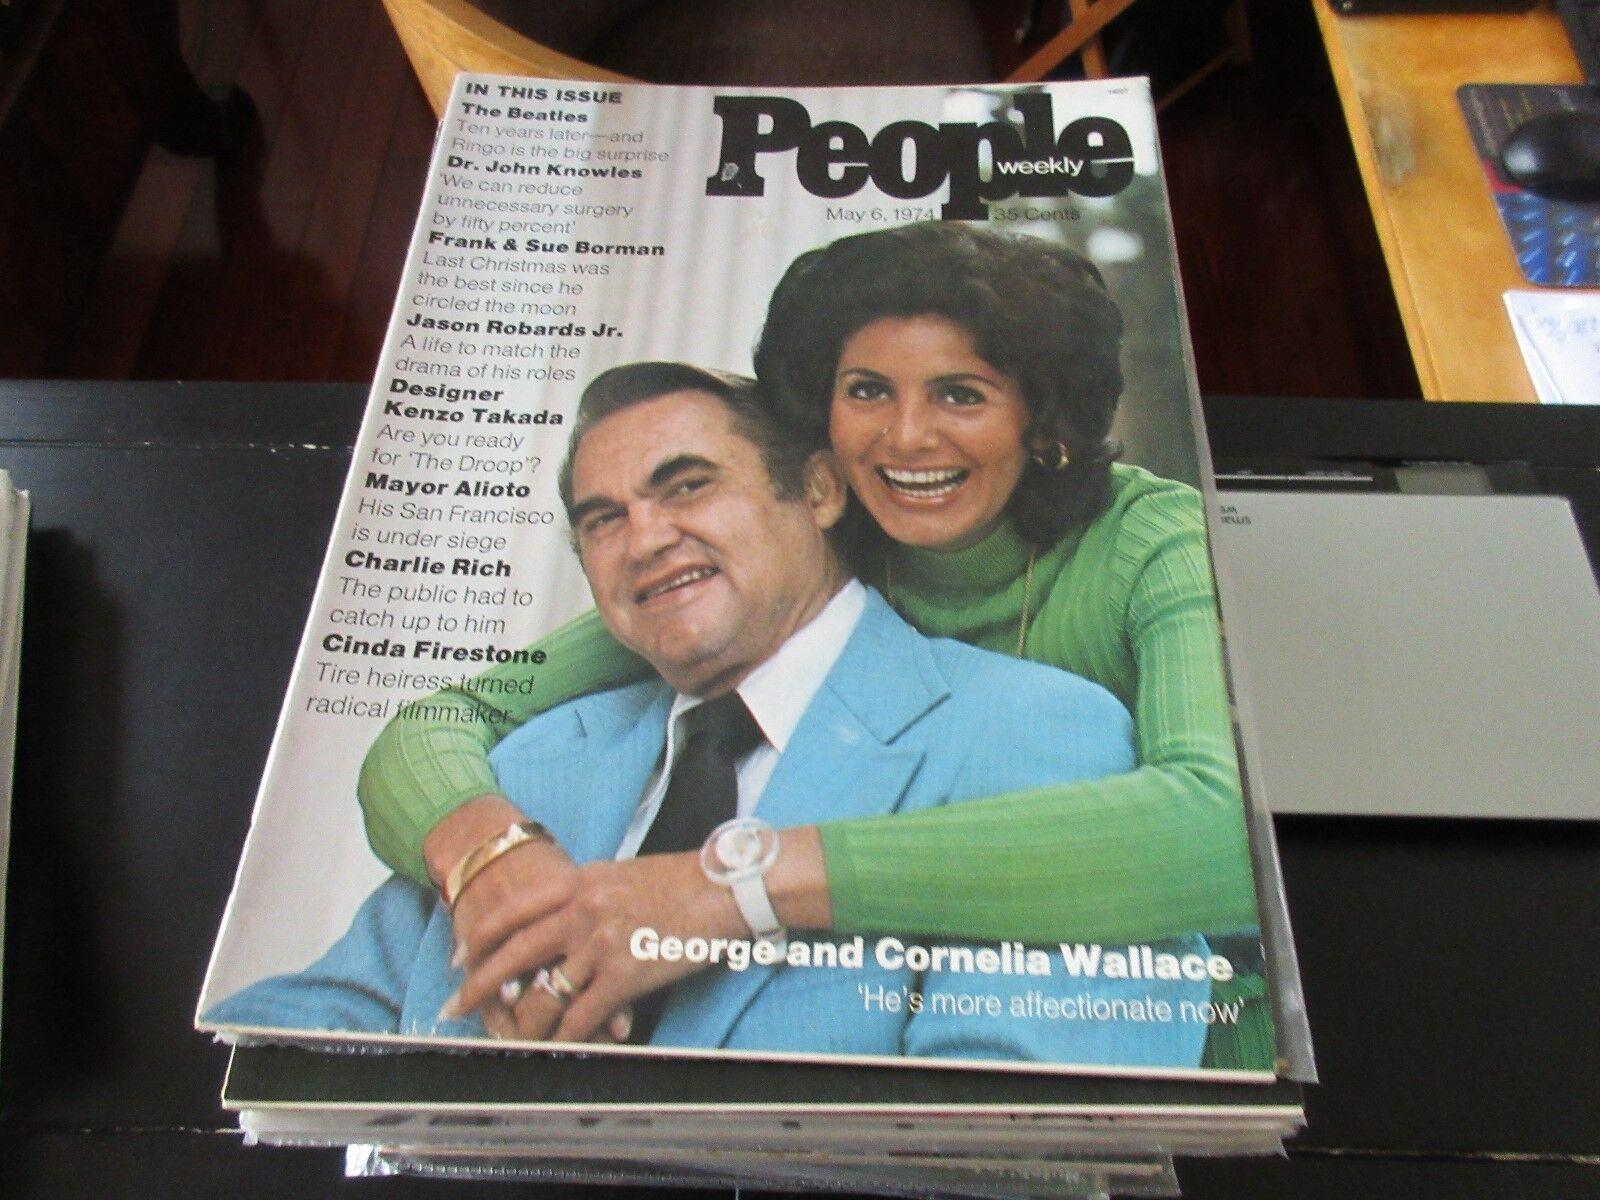 George & Cornelia Wallace , People Weekly , 5/6/74,The